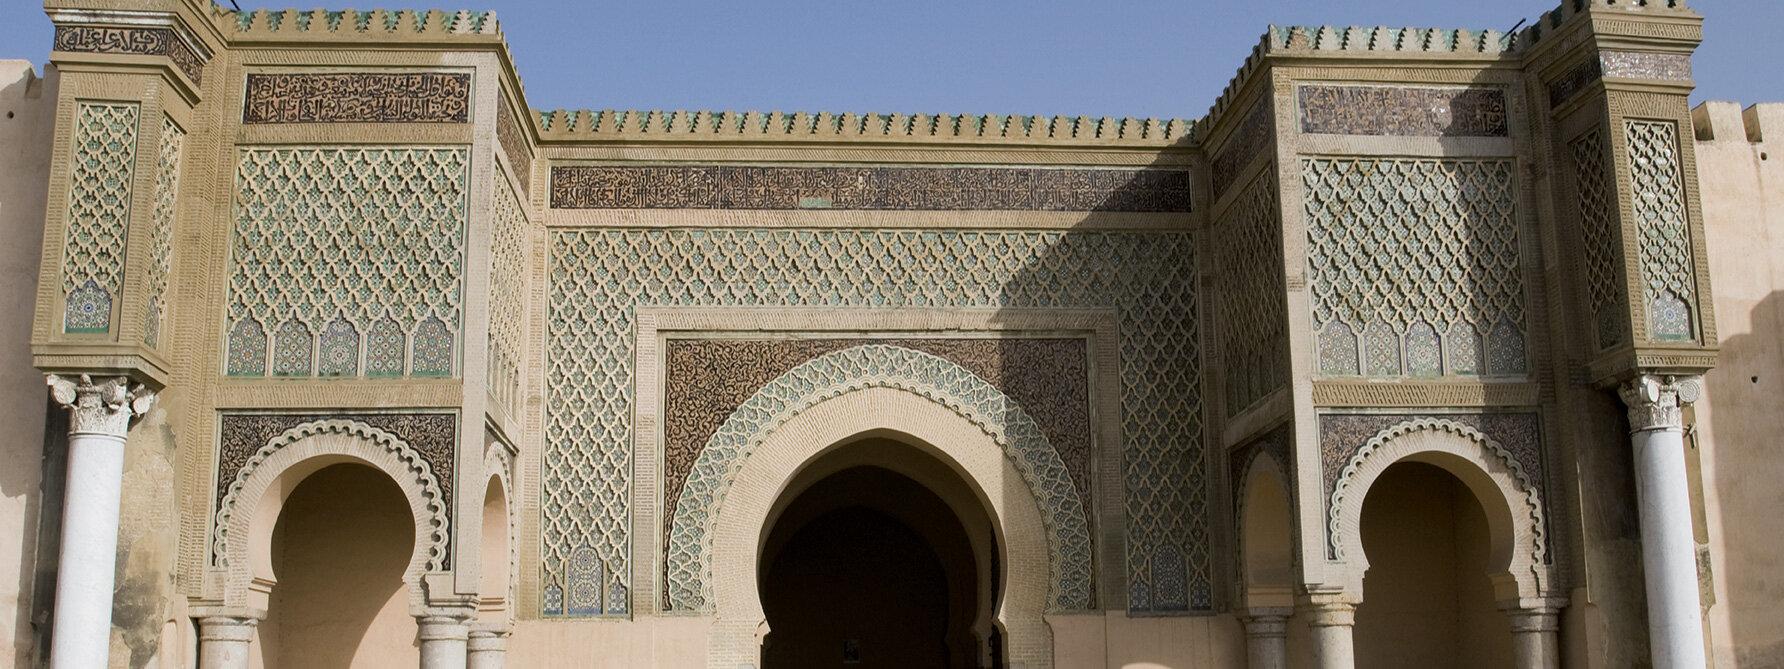 Meknes Bab-mansour.jpg